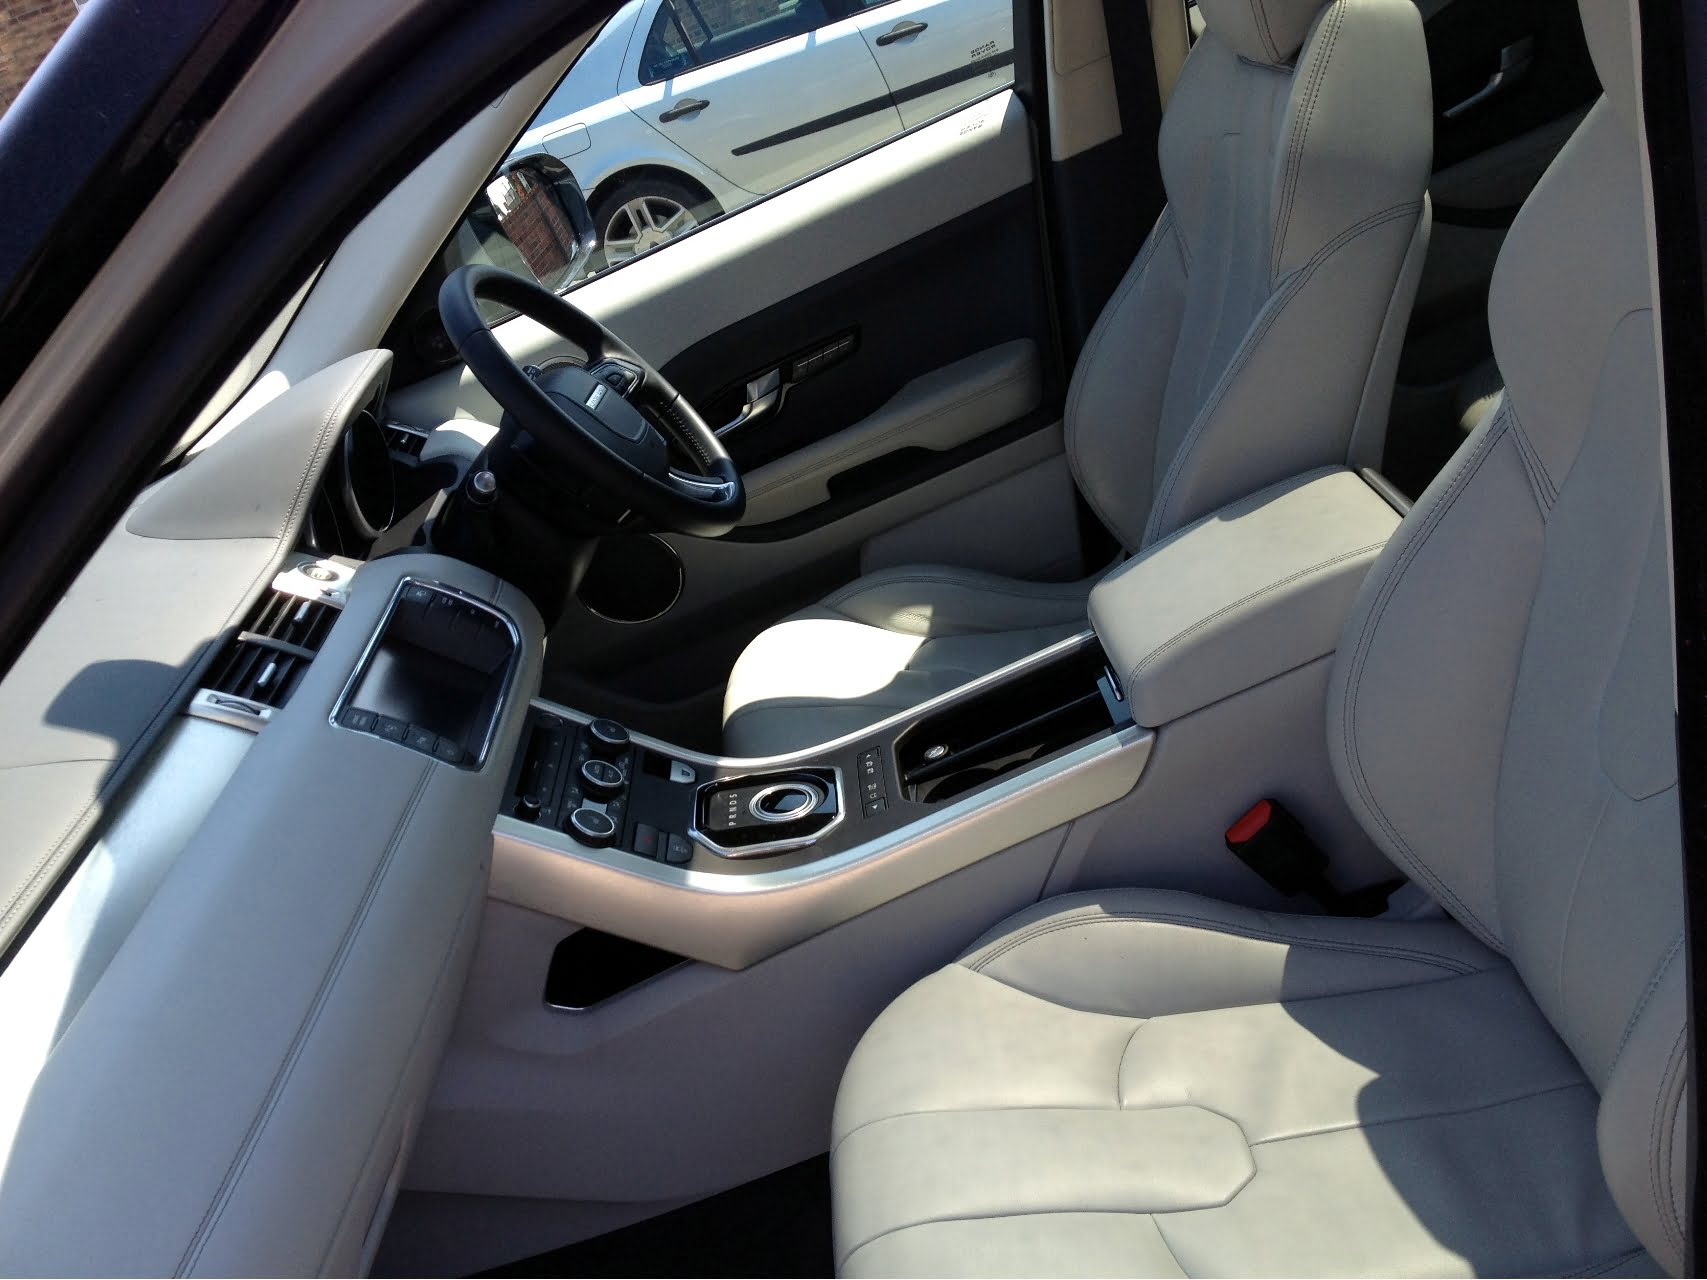 Range Rover Evoque Inside